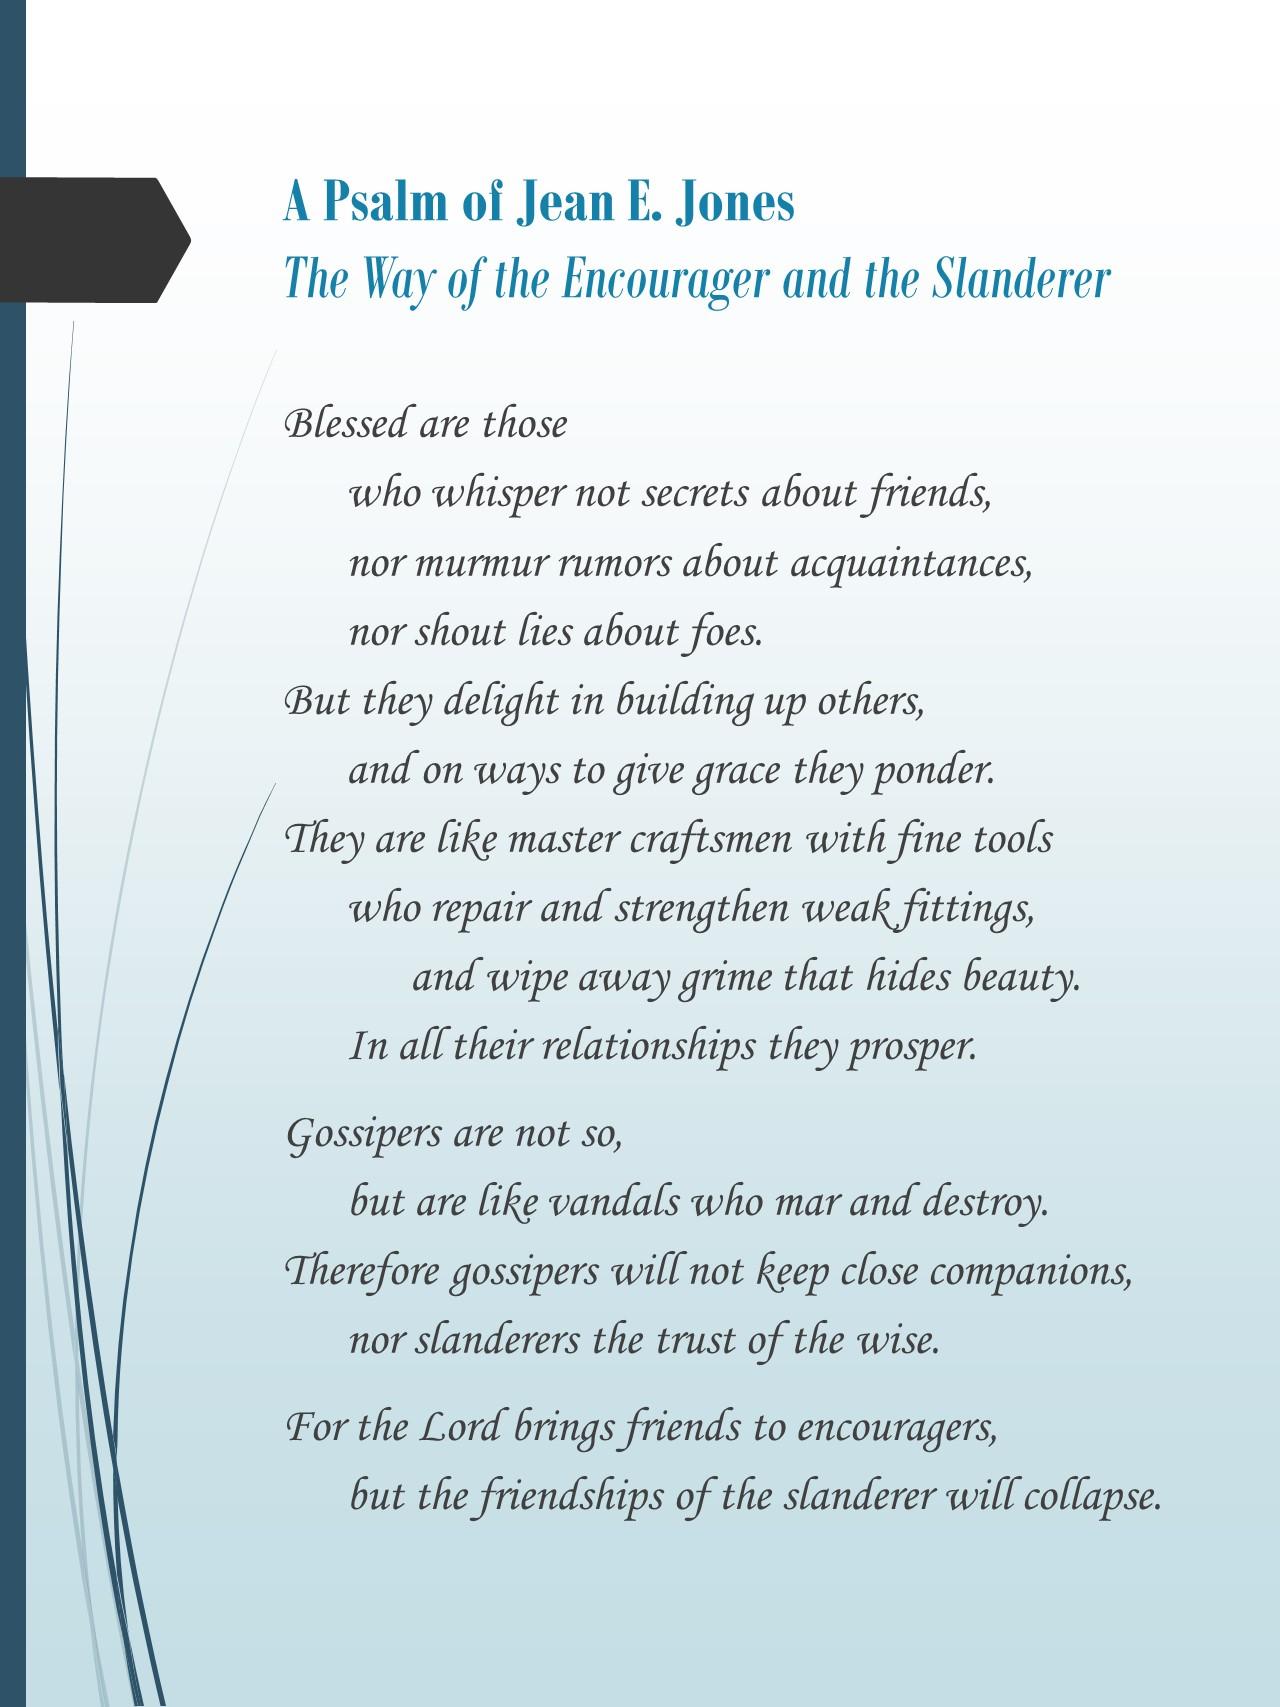 27 Reasons to Write a Wisdom Psalm (and How to Do It) - Jean E. Jones